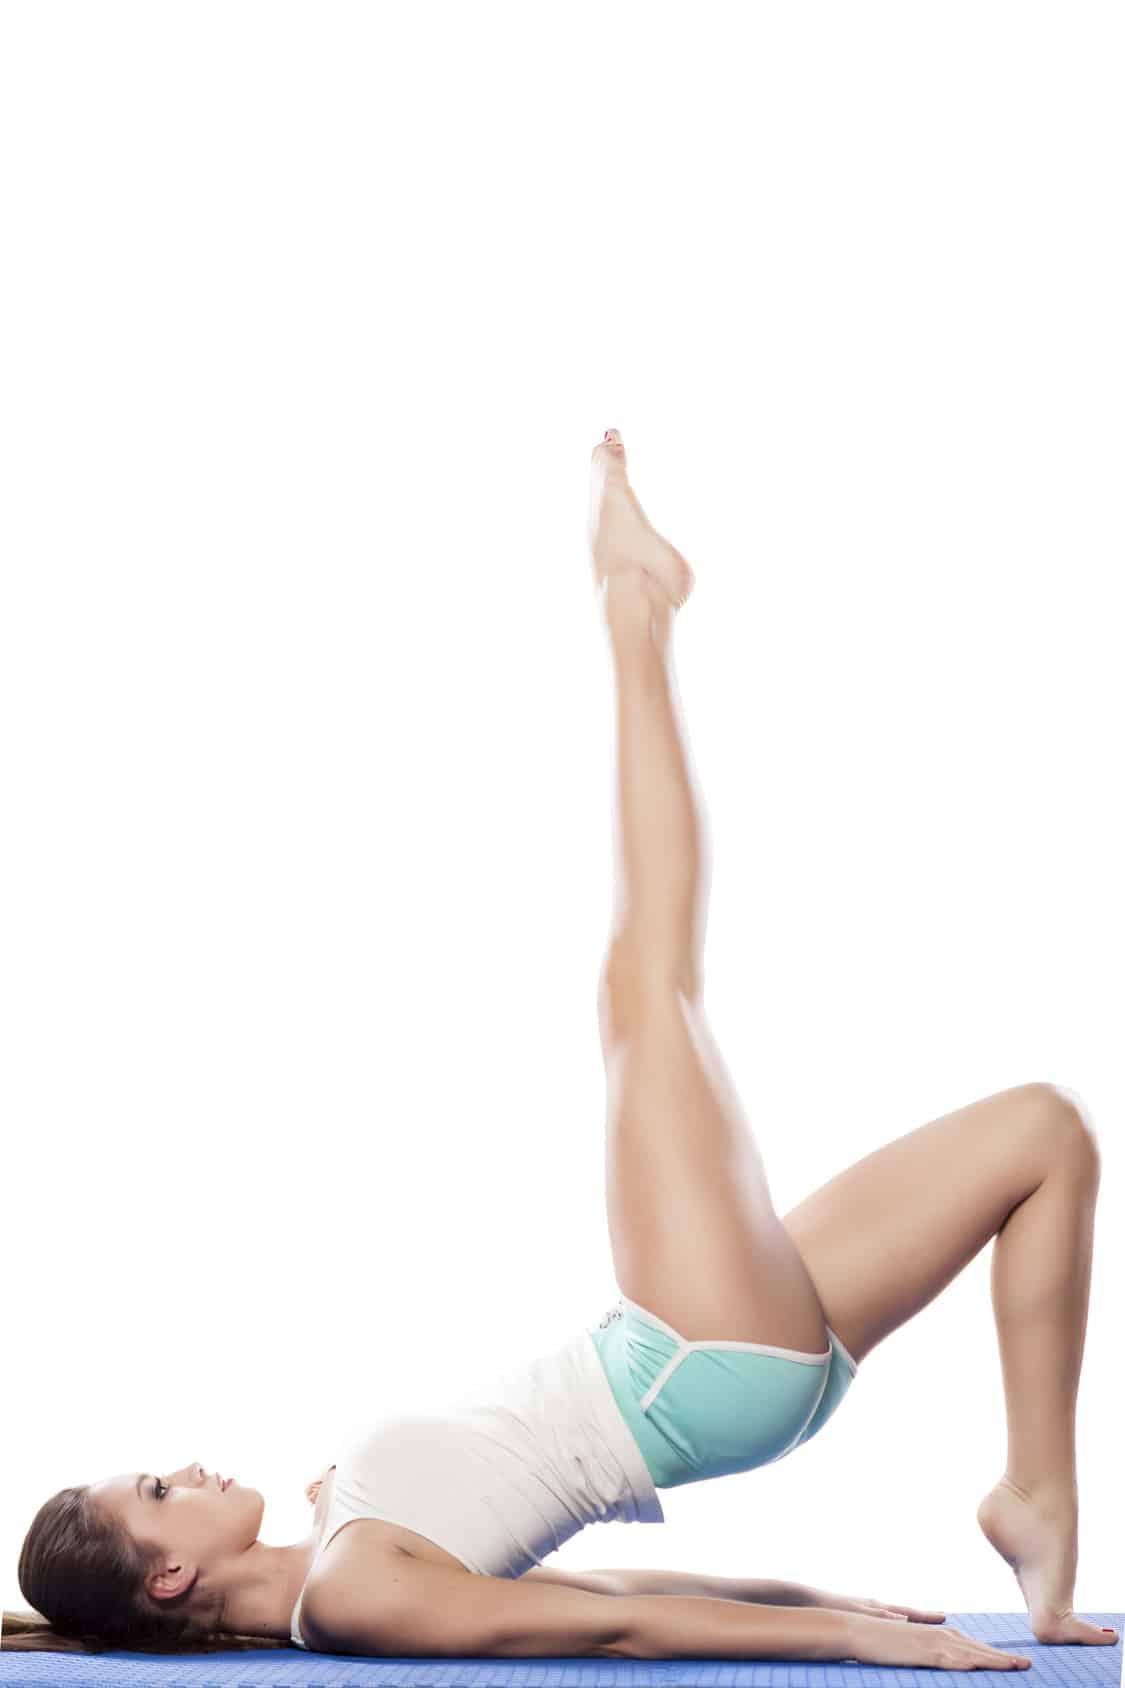 Young beautiful woman doing aerobics exercises